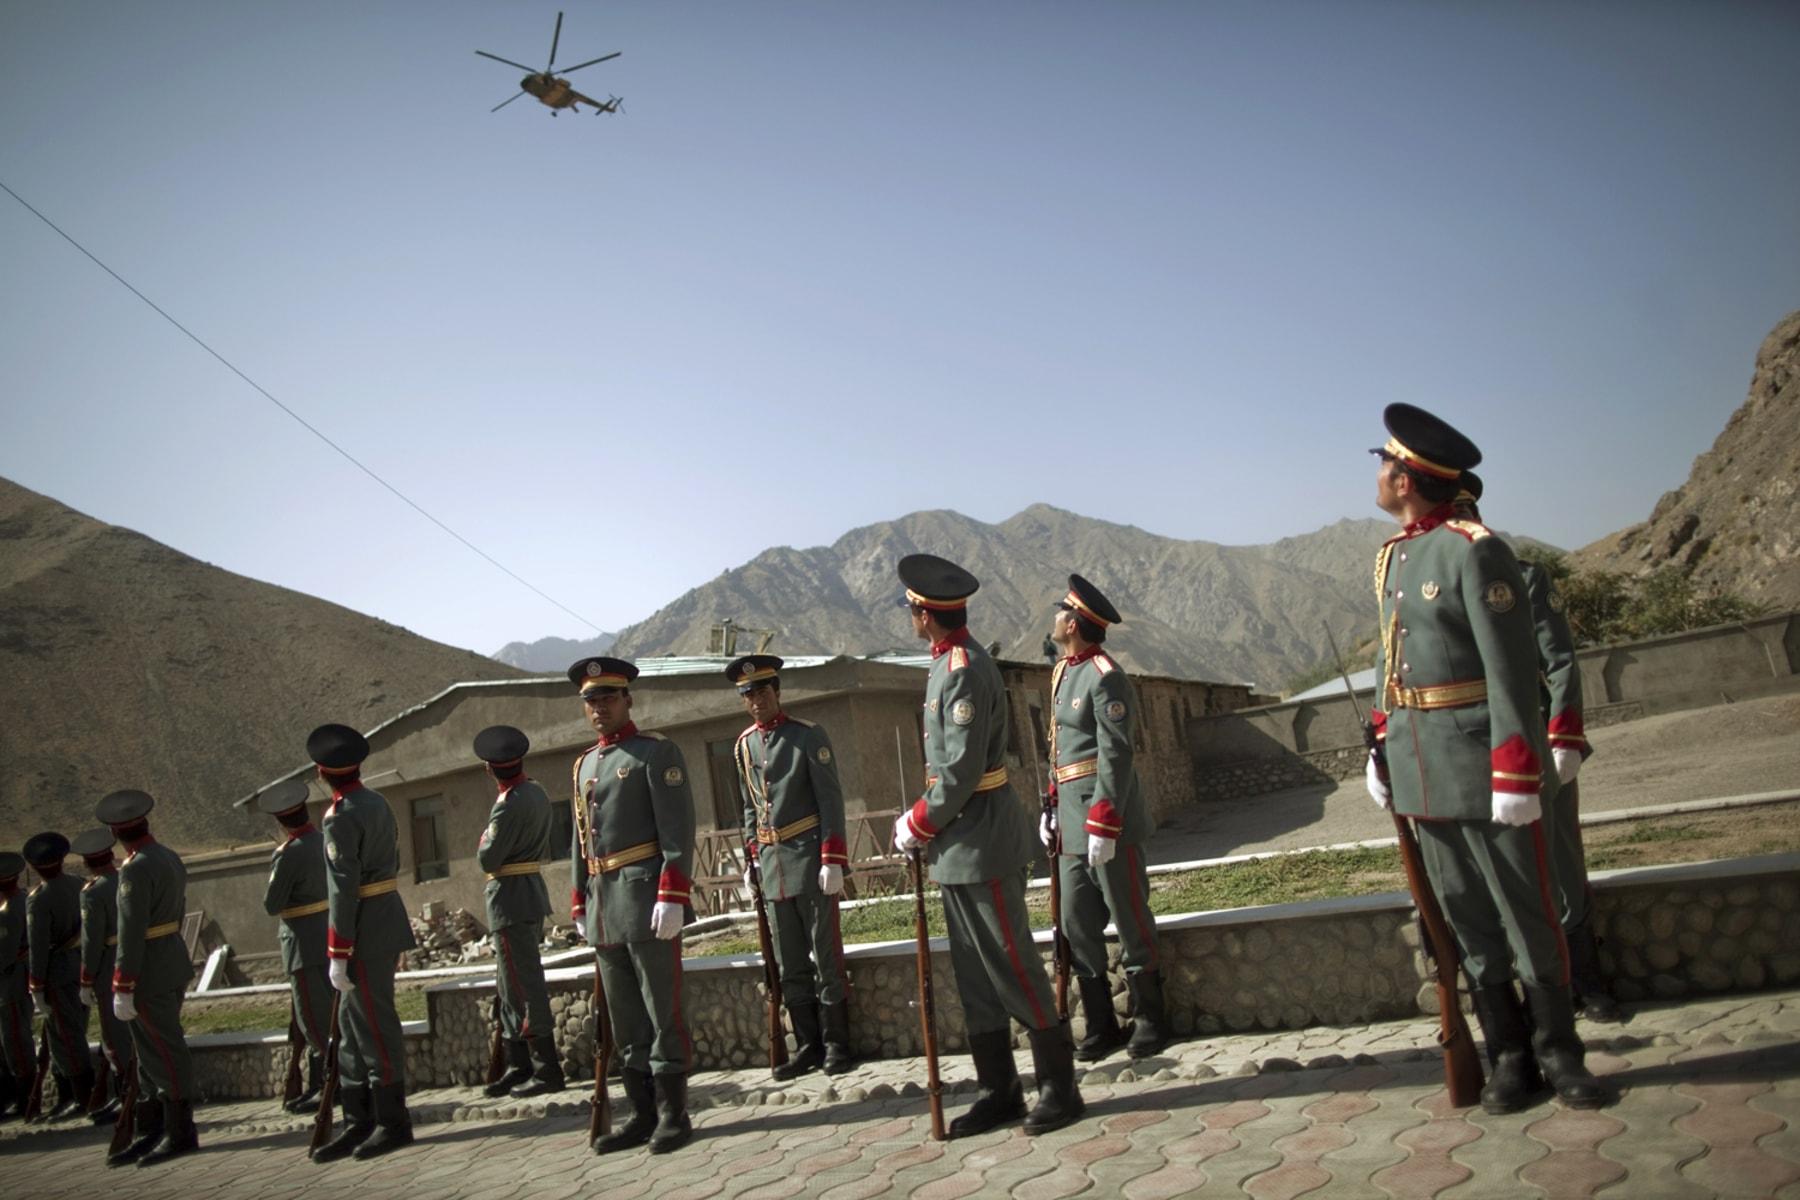 фото из афганистан новости